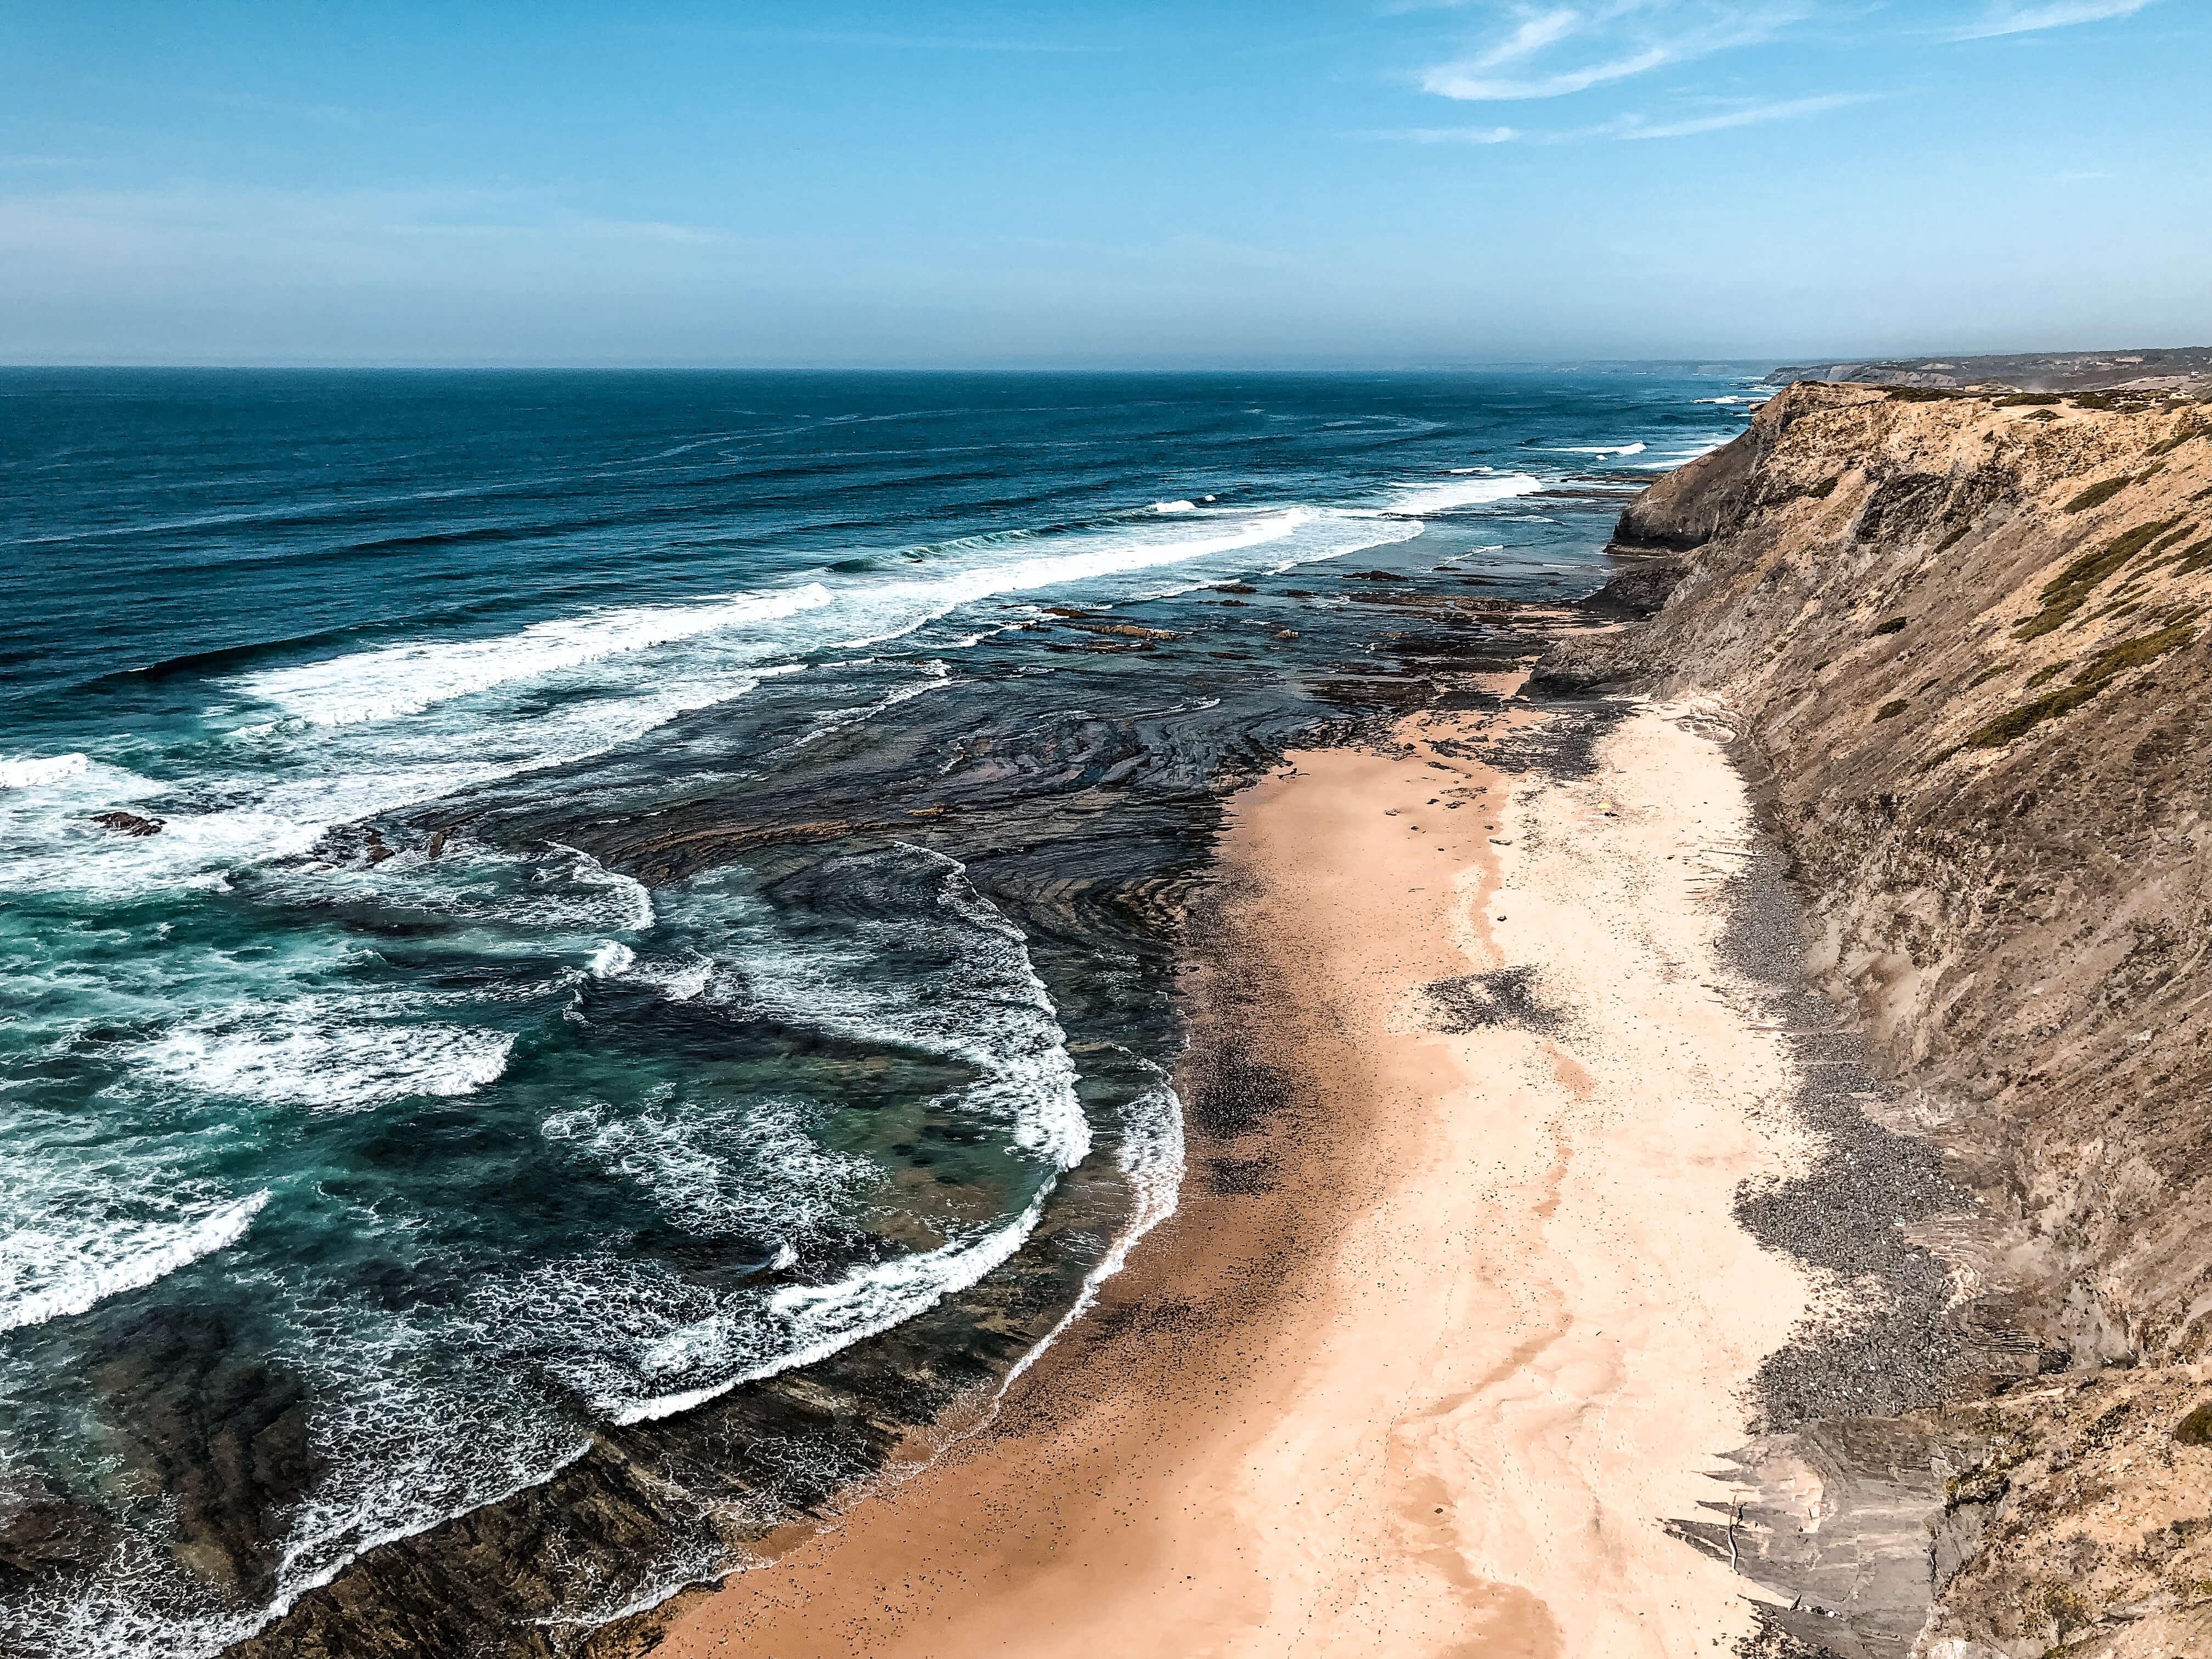 Roadtrip Portugal, Praia da Fateixa, 17